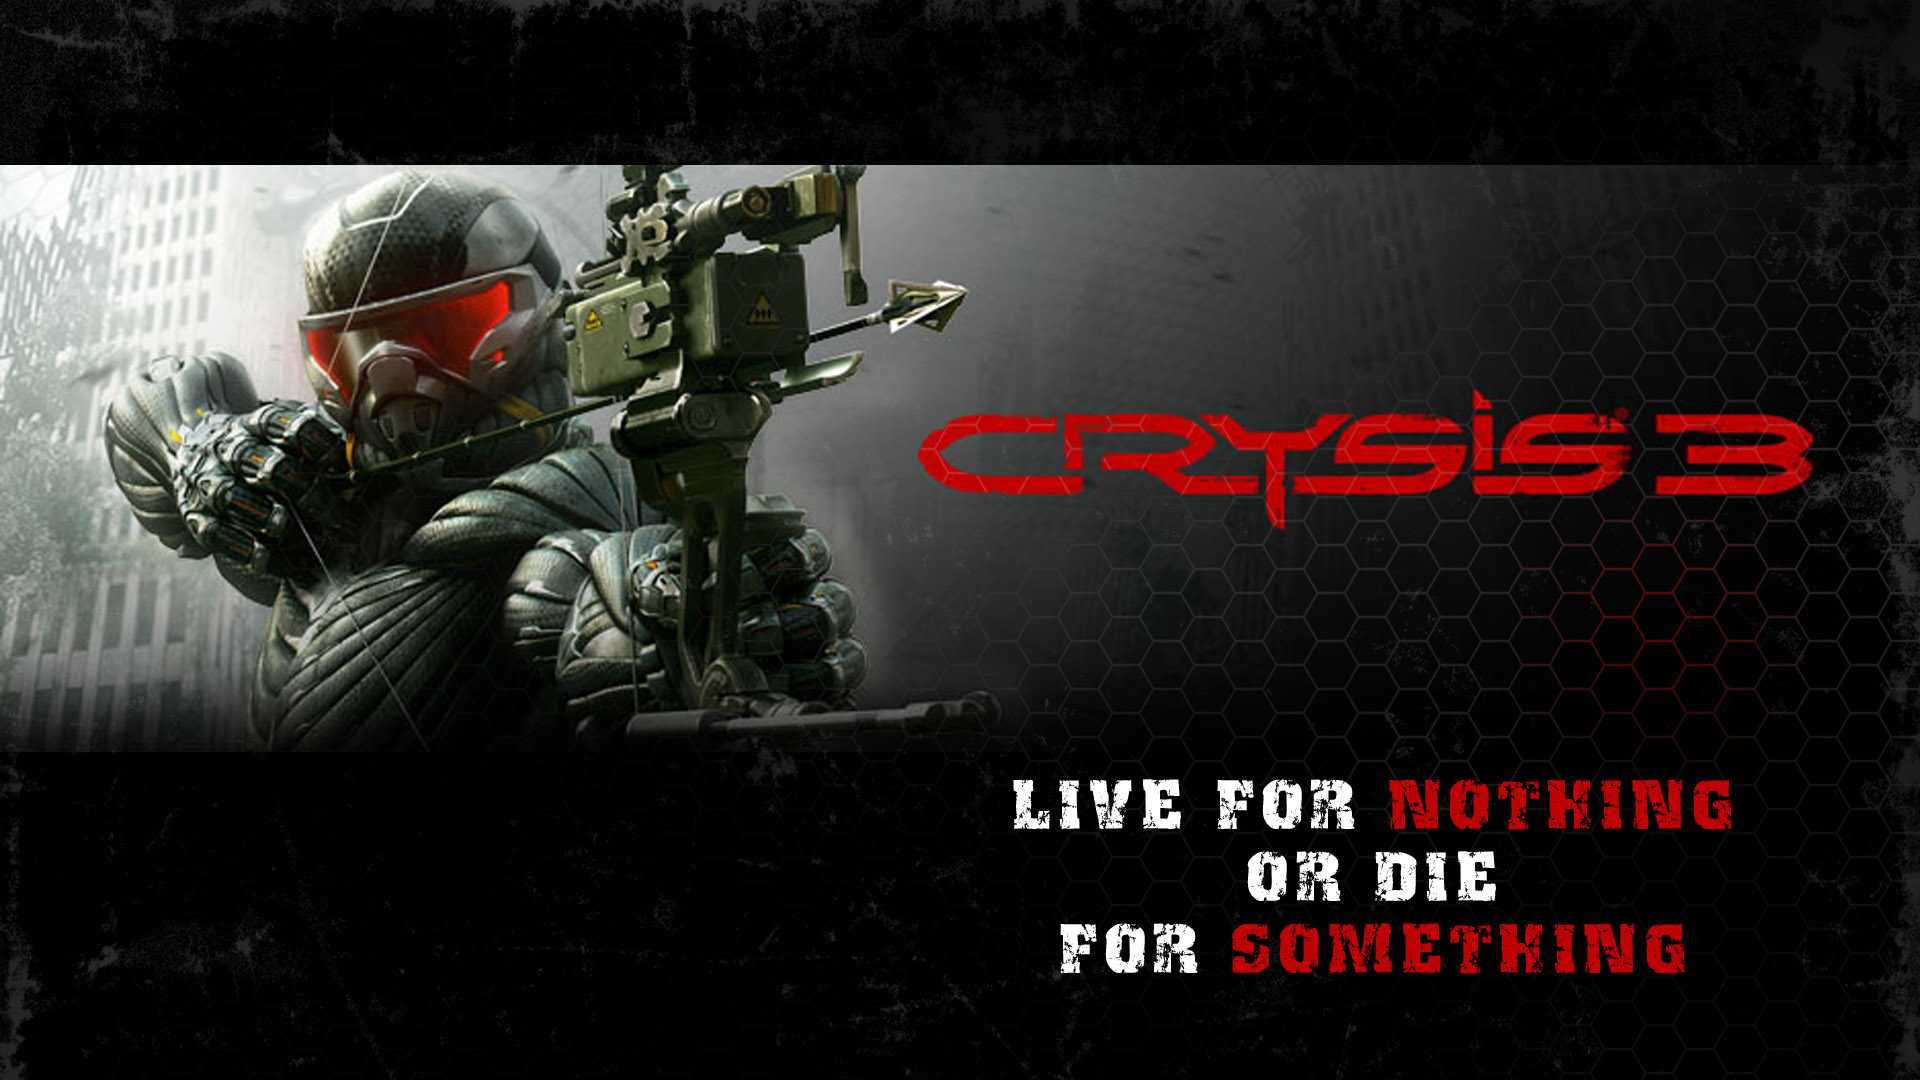 crysis 3 wallpaper by poser96 on deviantart